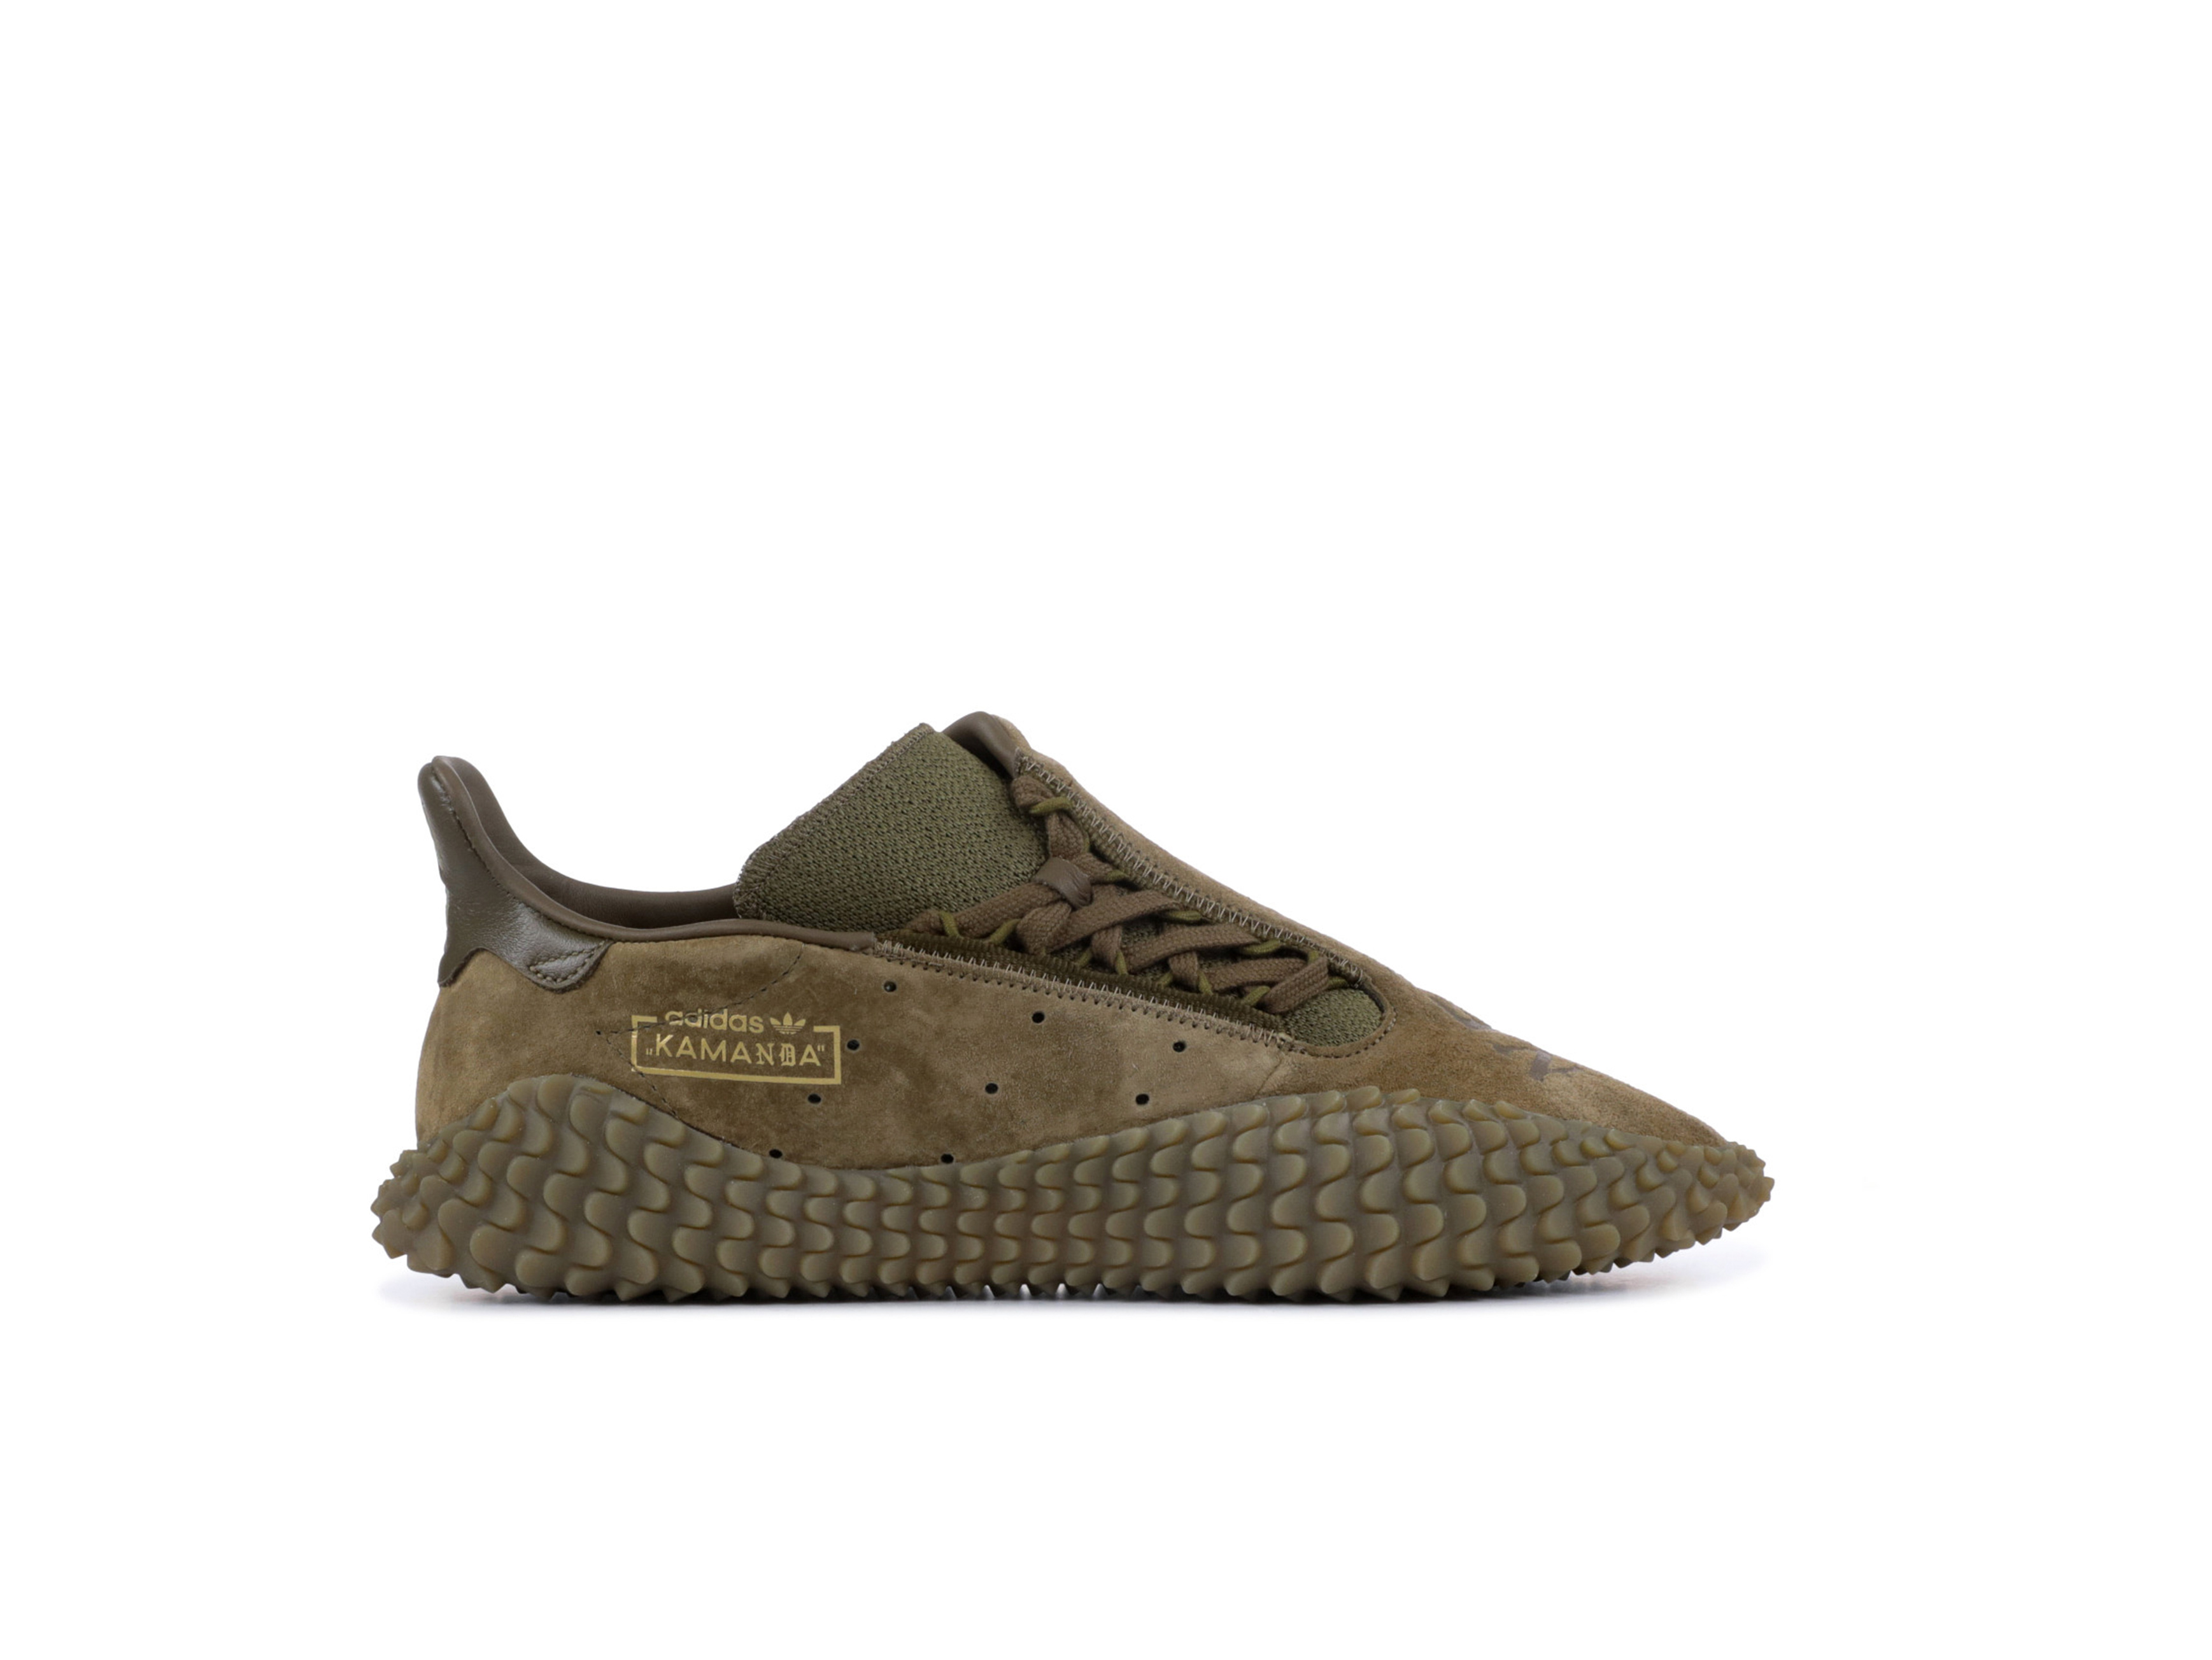 NMD City Sock Primeknit (Core BlackLush Blue) Sneaker Freaker